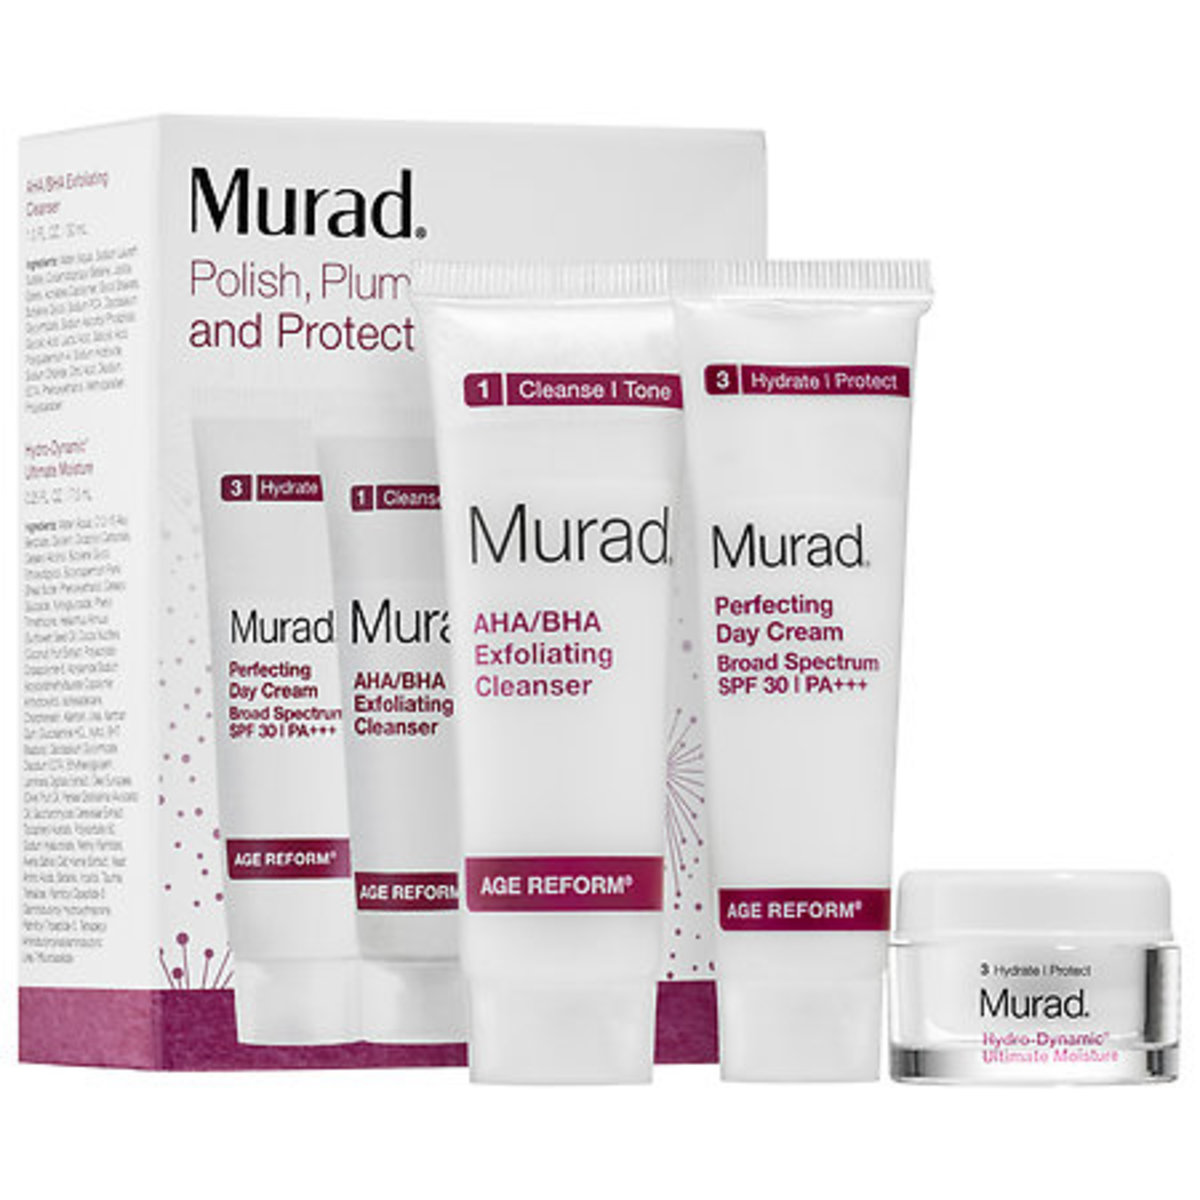 Murad Polish, Plump and Protect